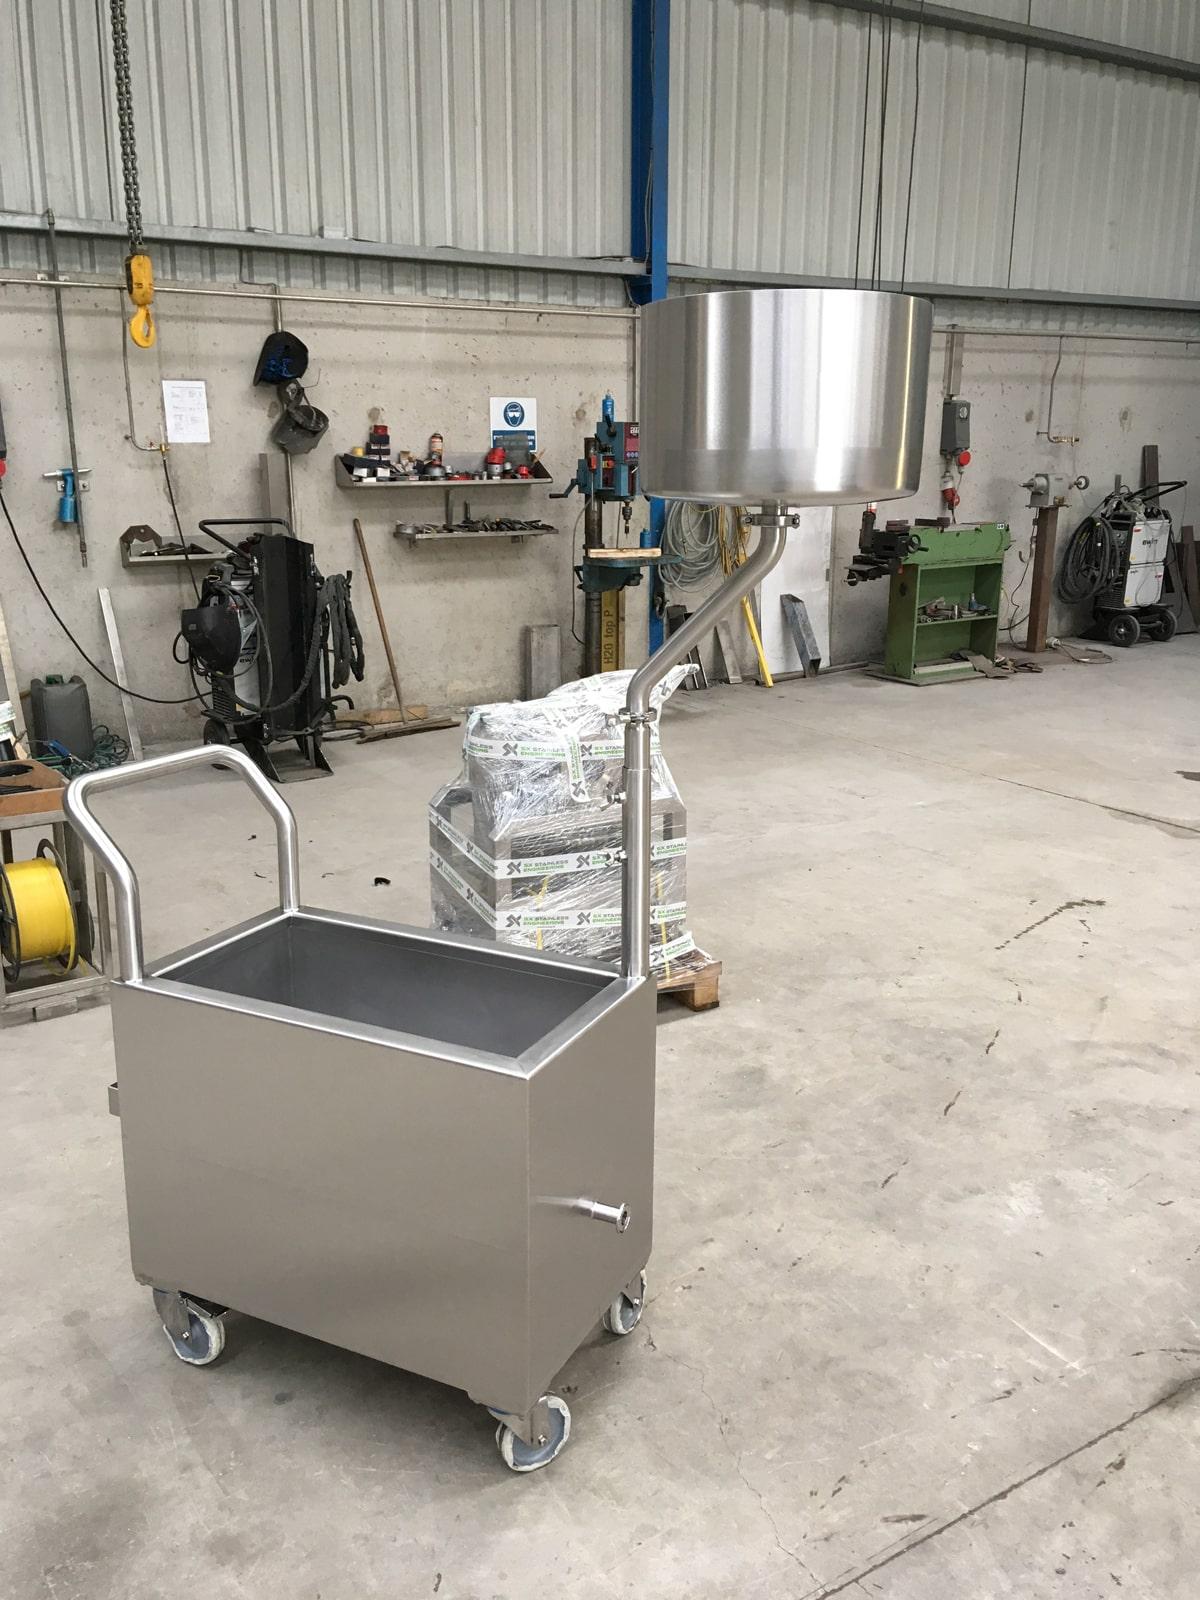 Bespoke Fabrications - SX Engineering - Shower test rig trolley